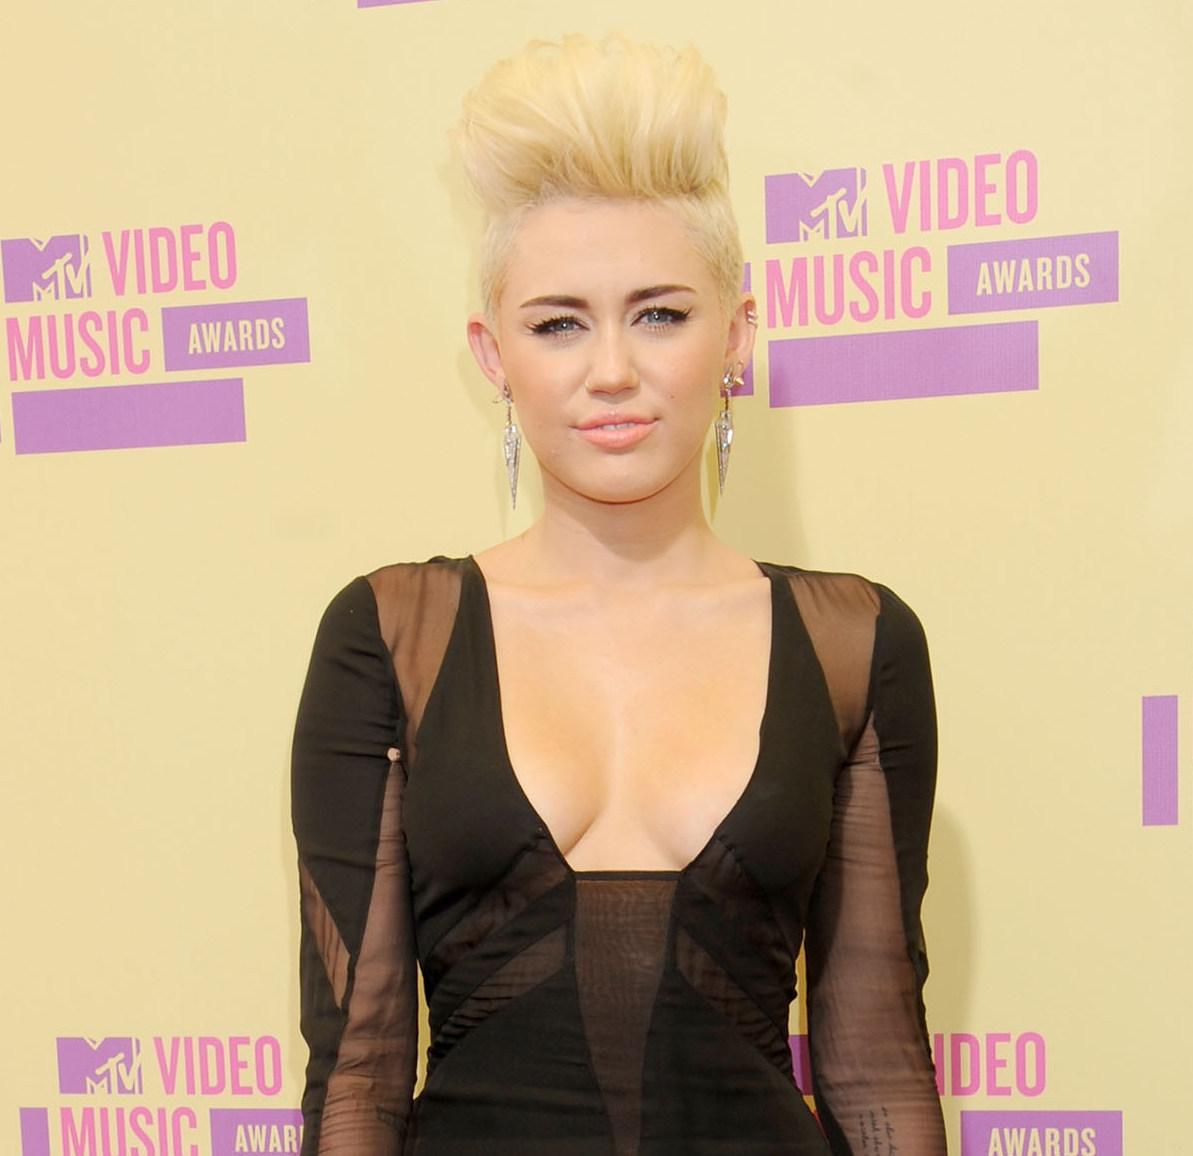 Miley Cyrus edgy